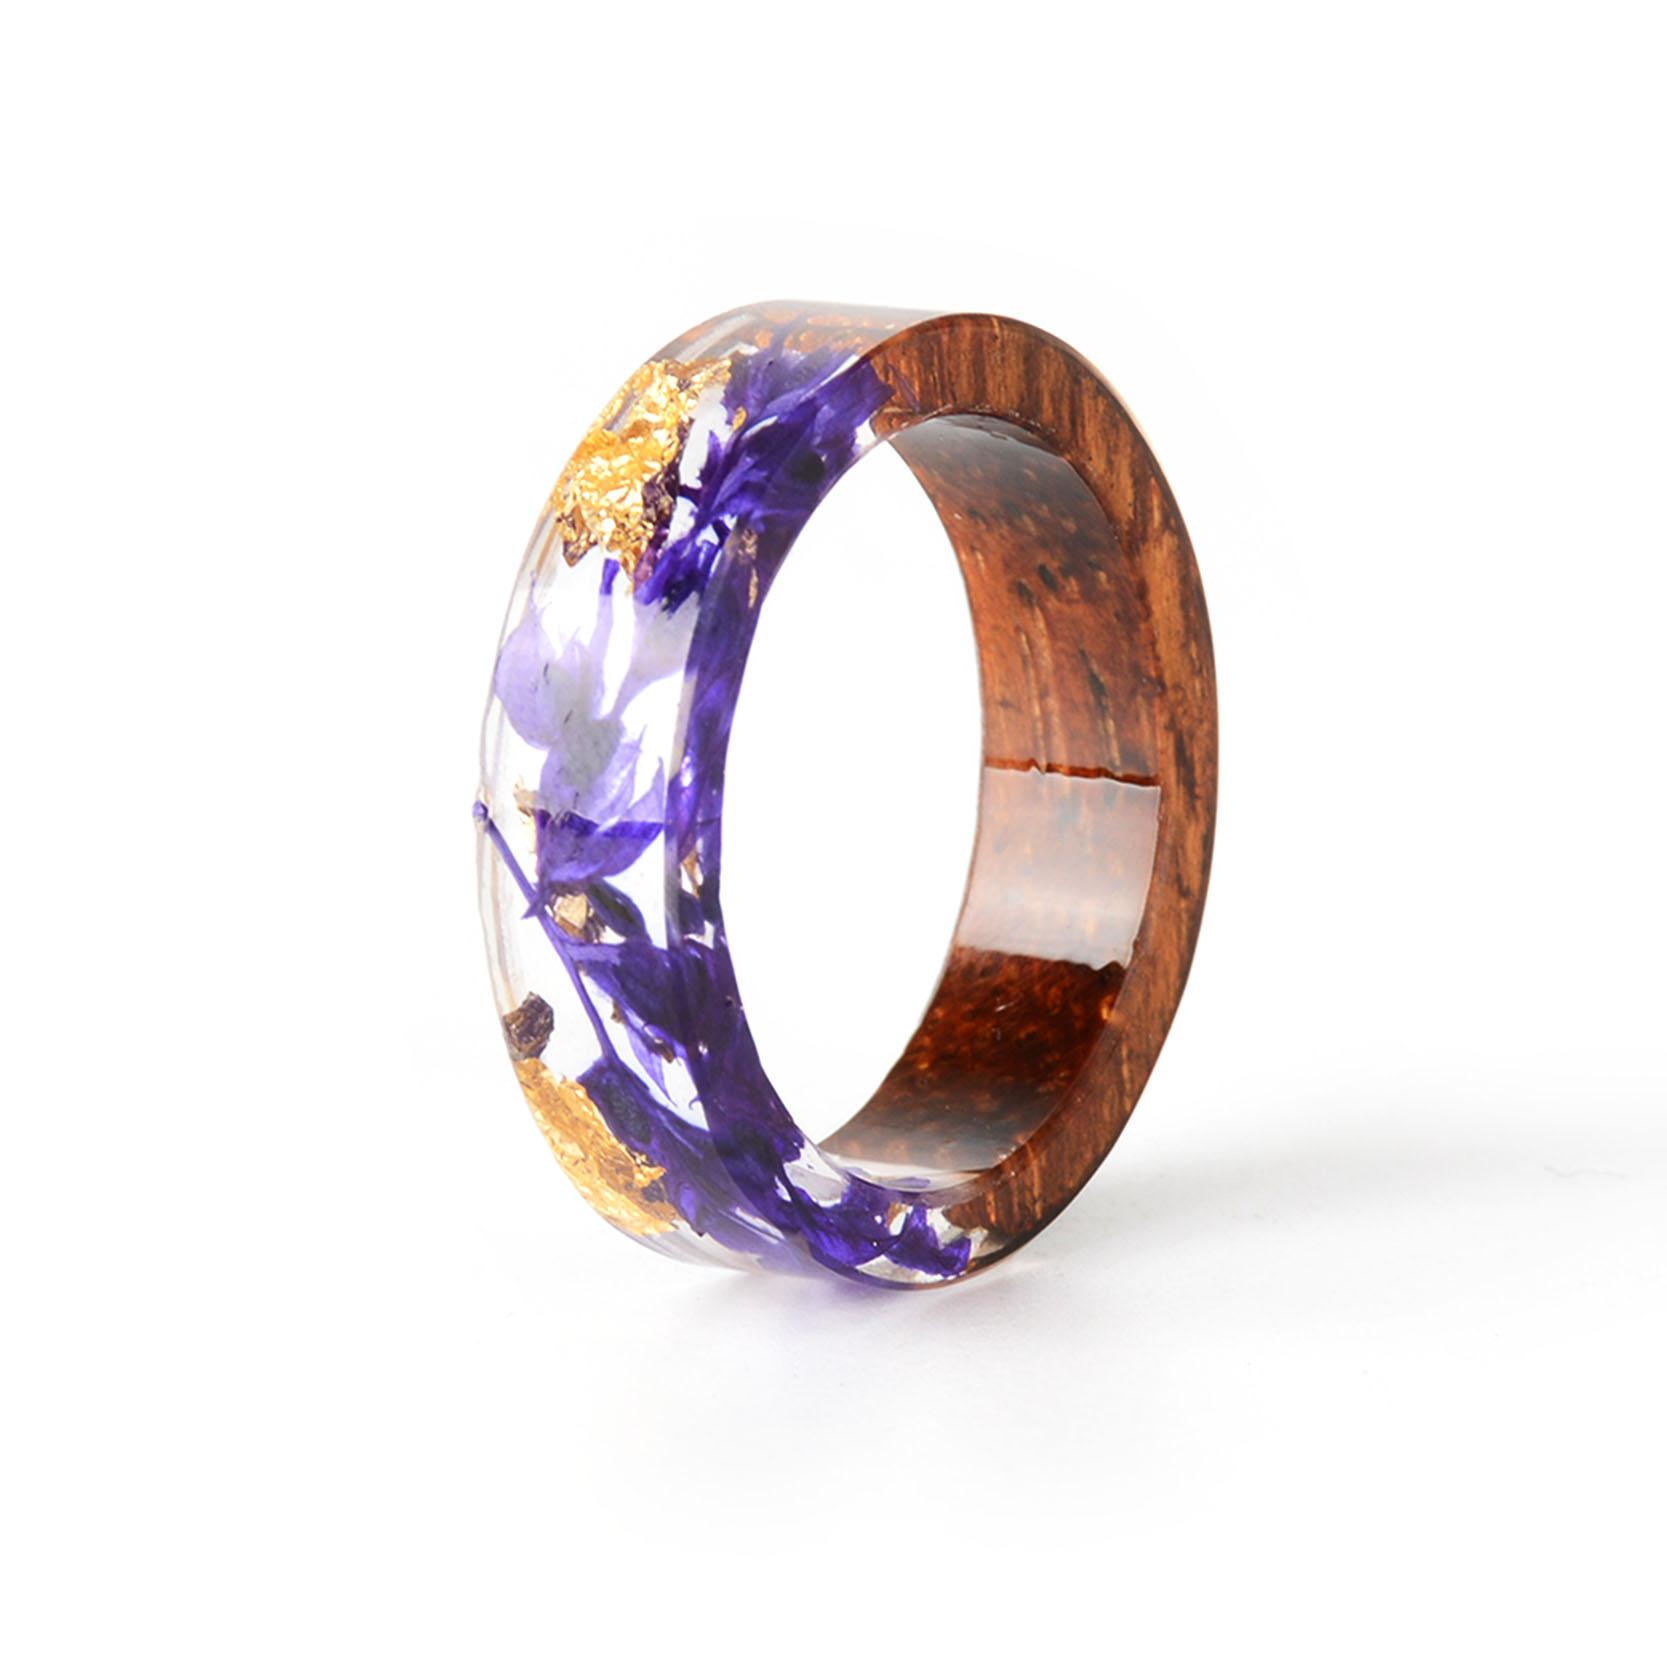 Handmade Wood Resin Ring Many Styles 23